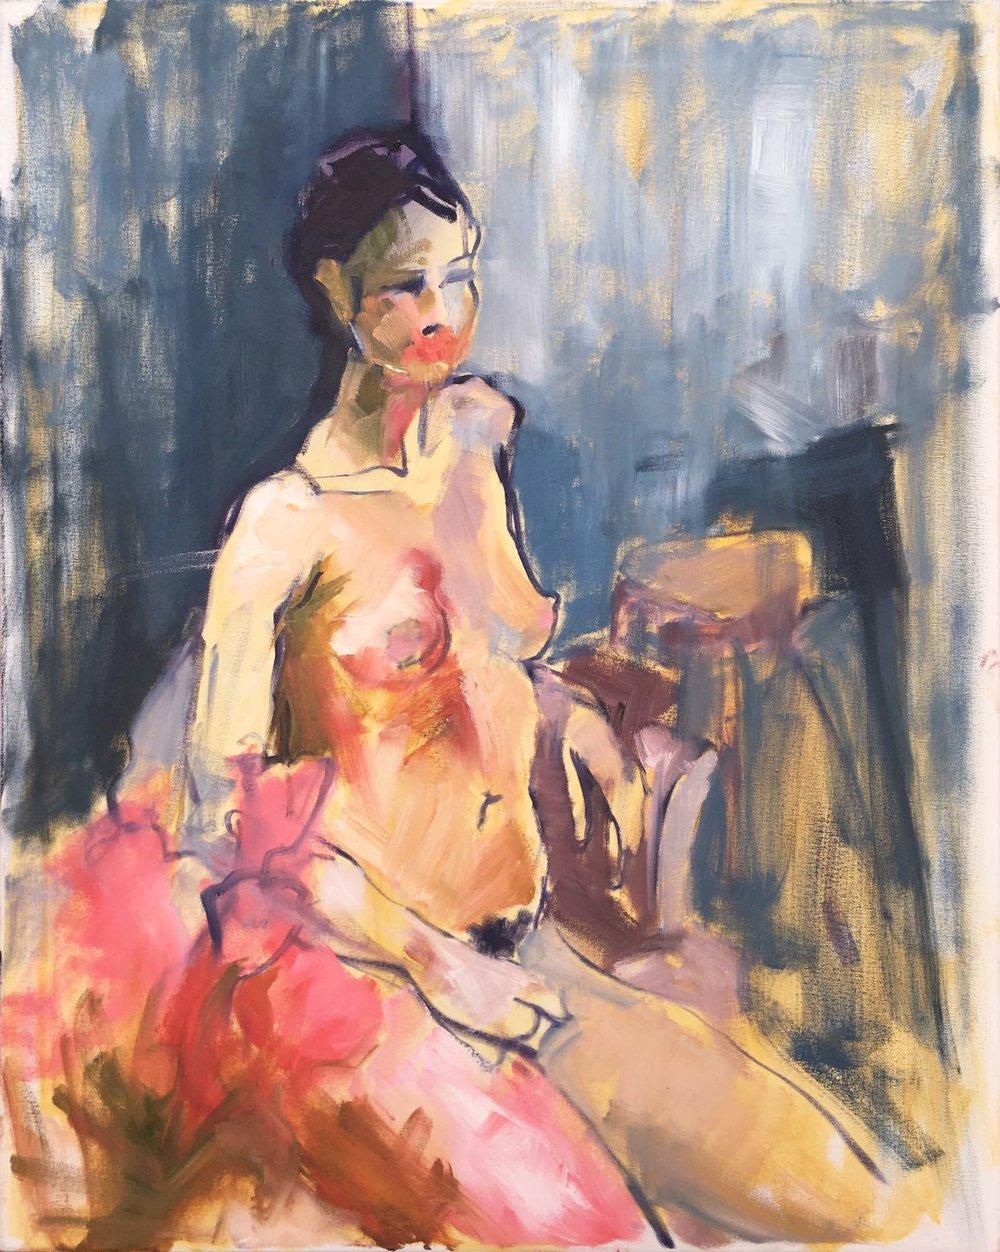 Woman Through Pink Flowers I 2018. Oil on canvas, w61 x h76cm (w65 x h80cm framed).